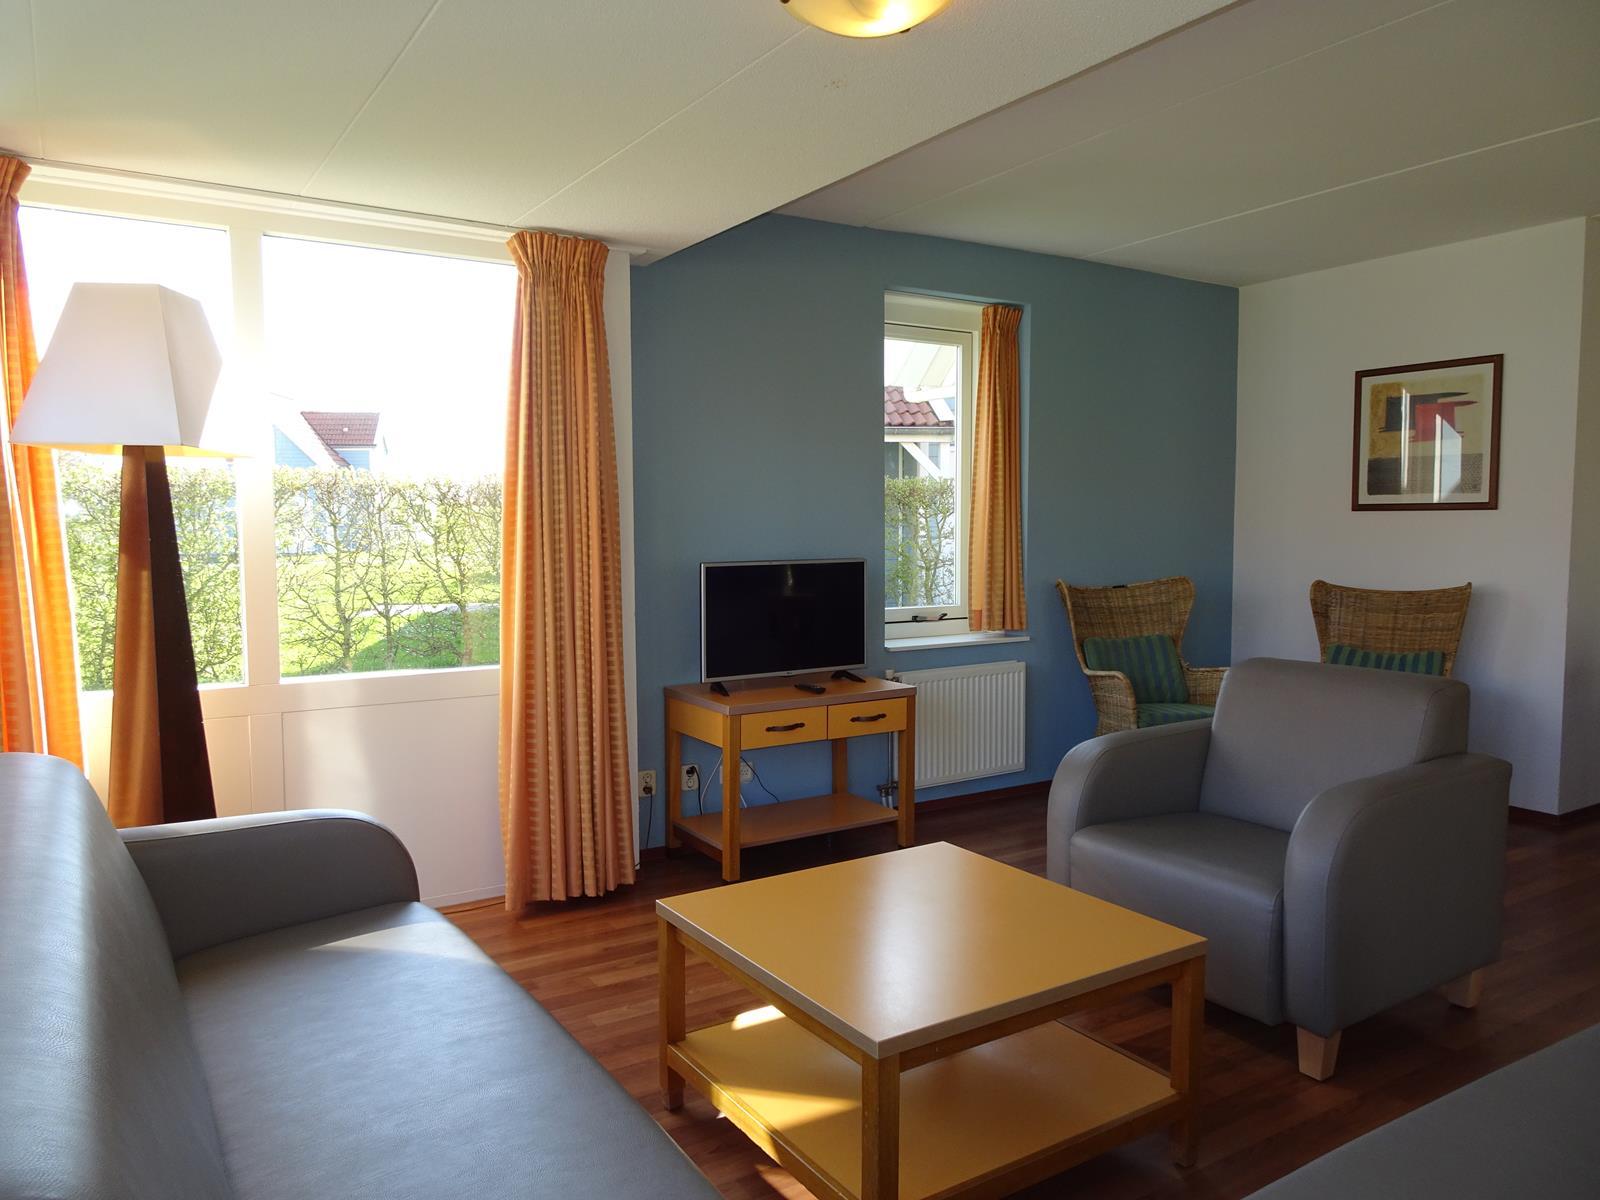 Vakantiehuis te koop Zeeland Brunisse K48 (5).jpg